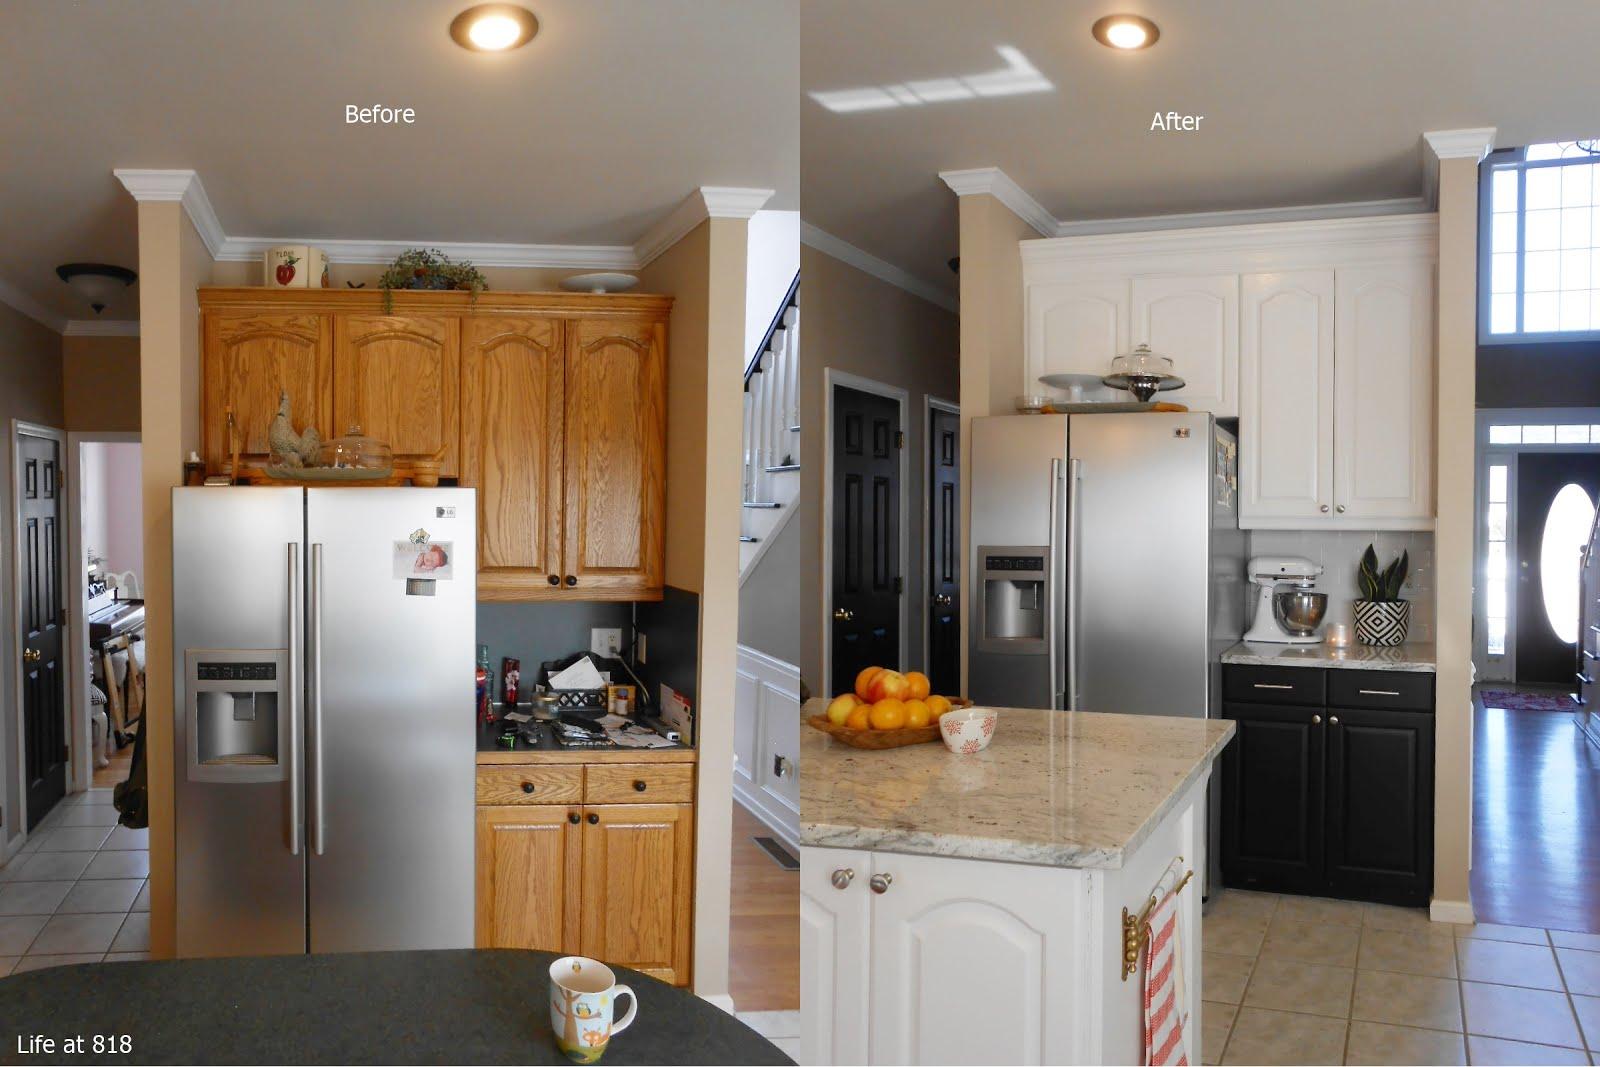 Life At 818 Kitchen Renovation Reveal